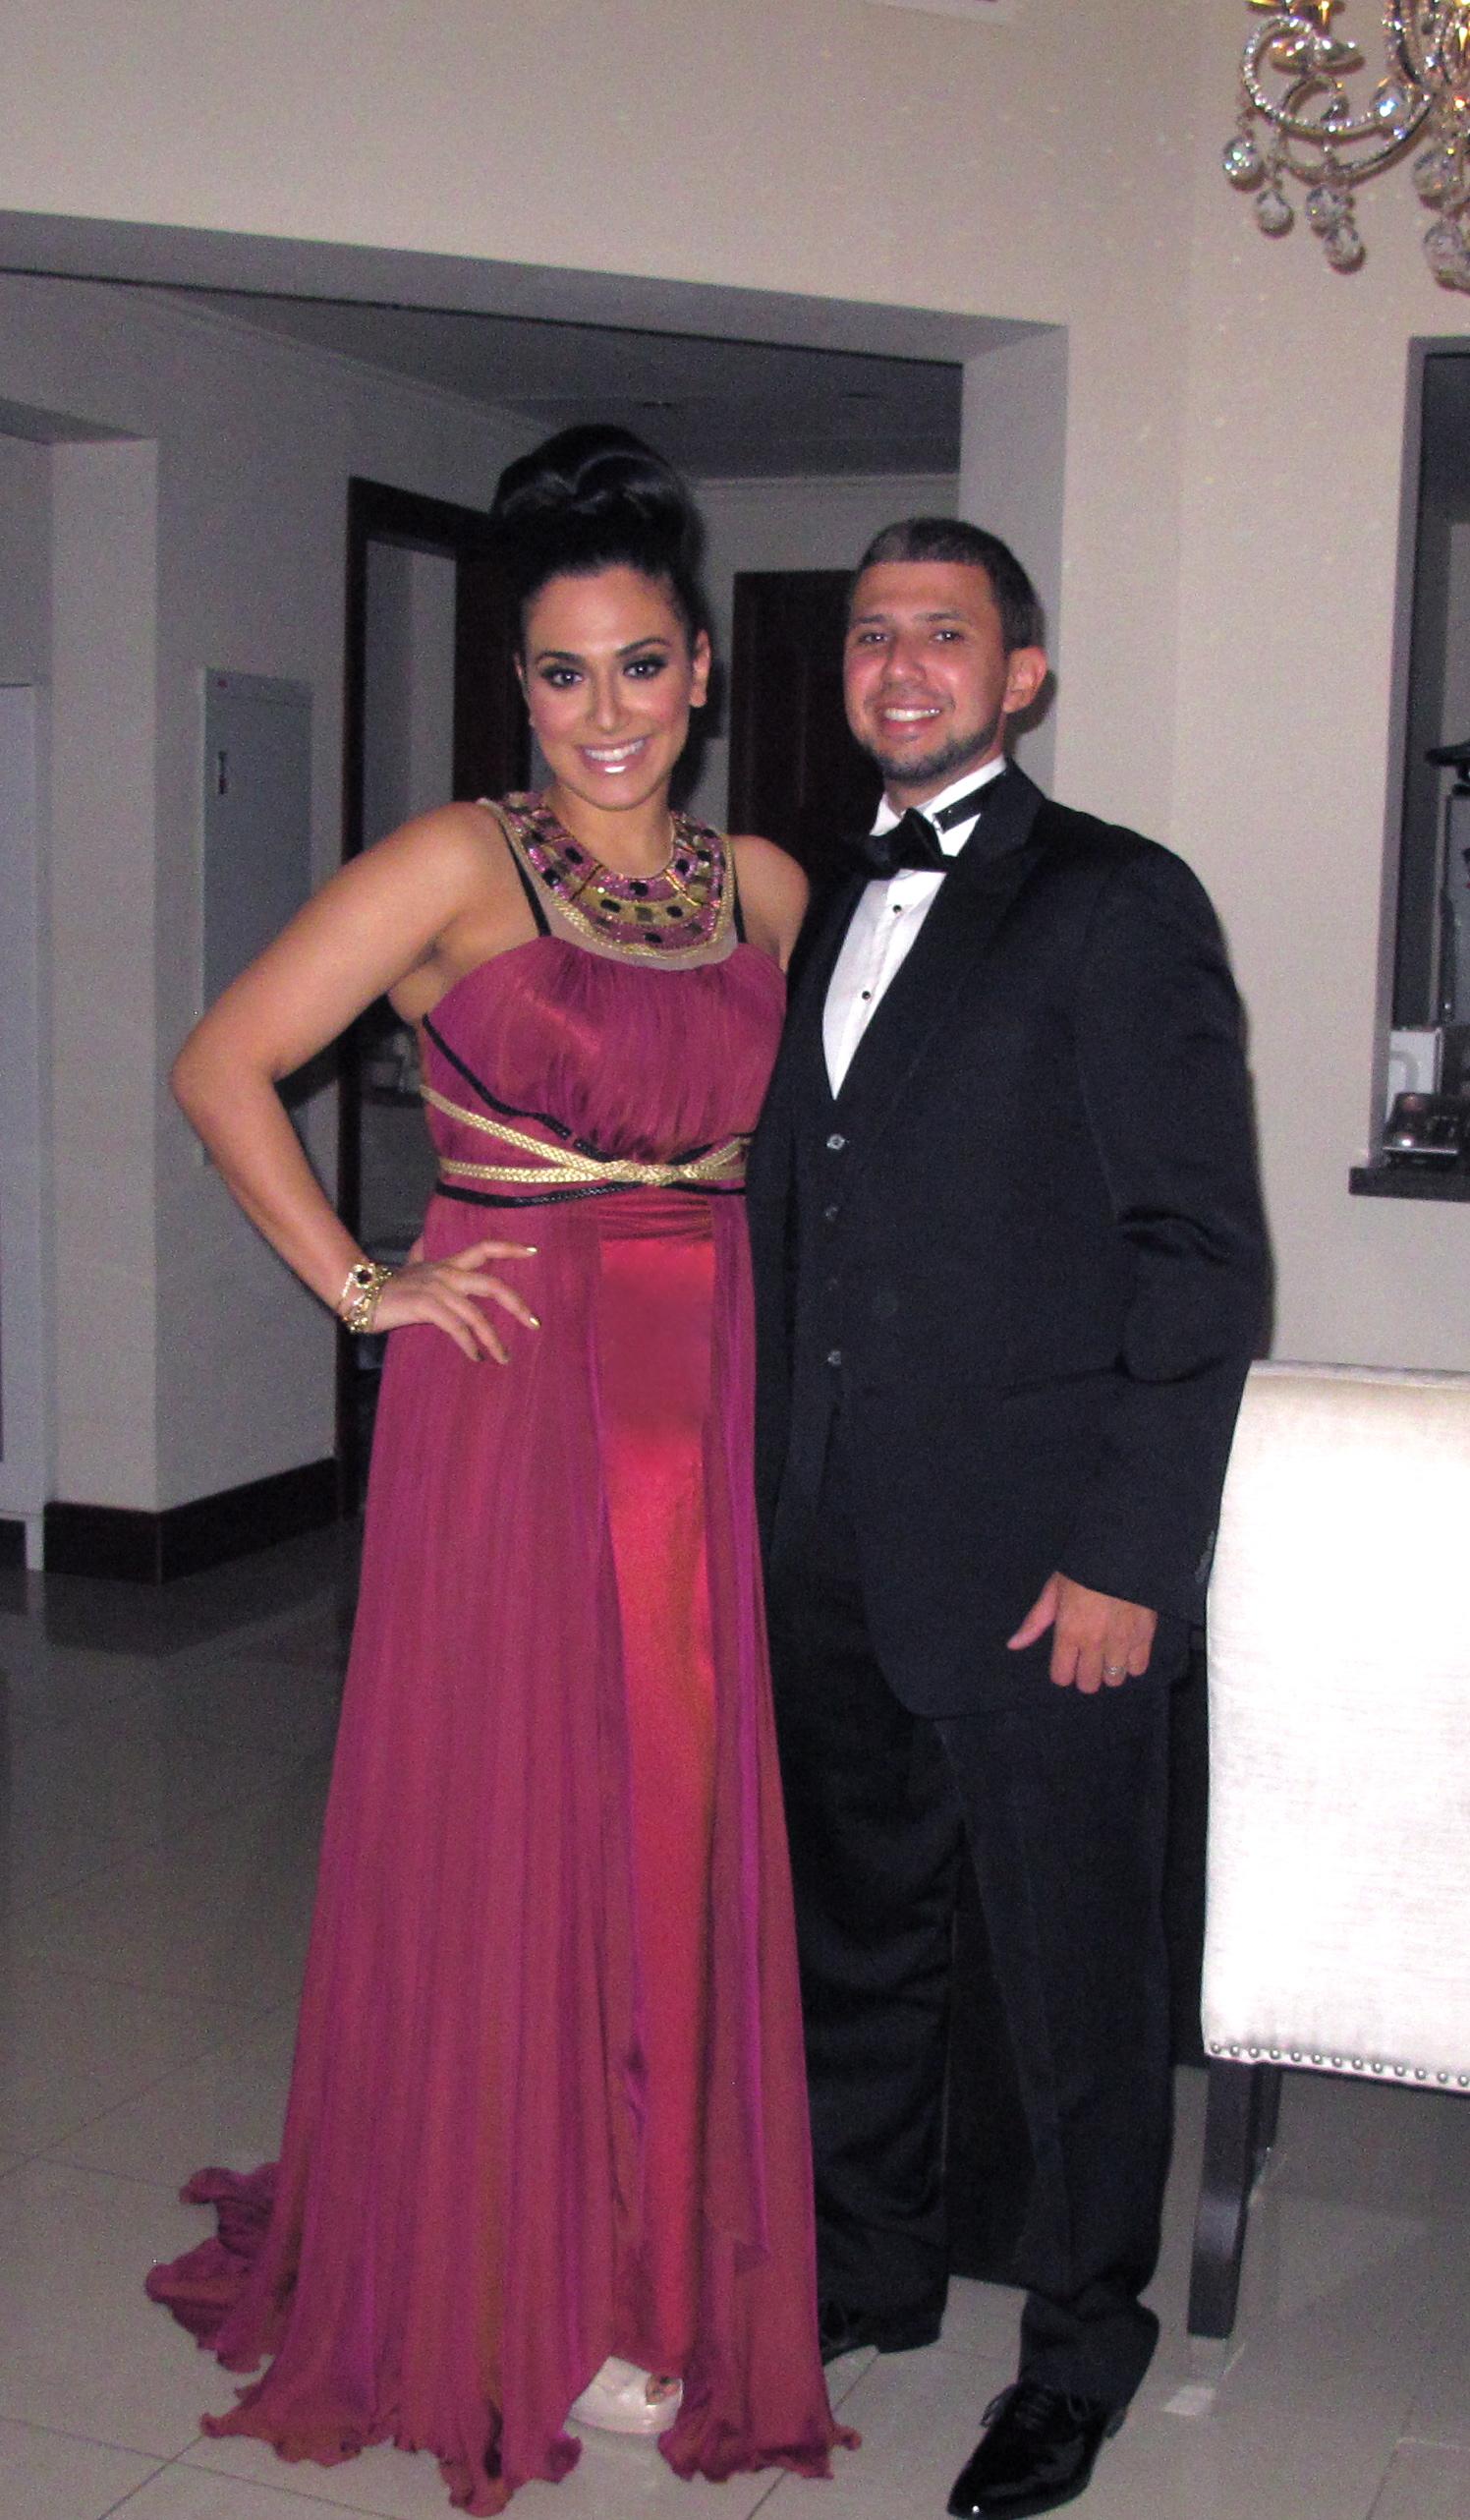 Photo of Huda and her husband Christopher[7]